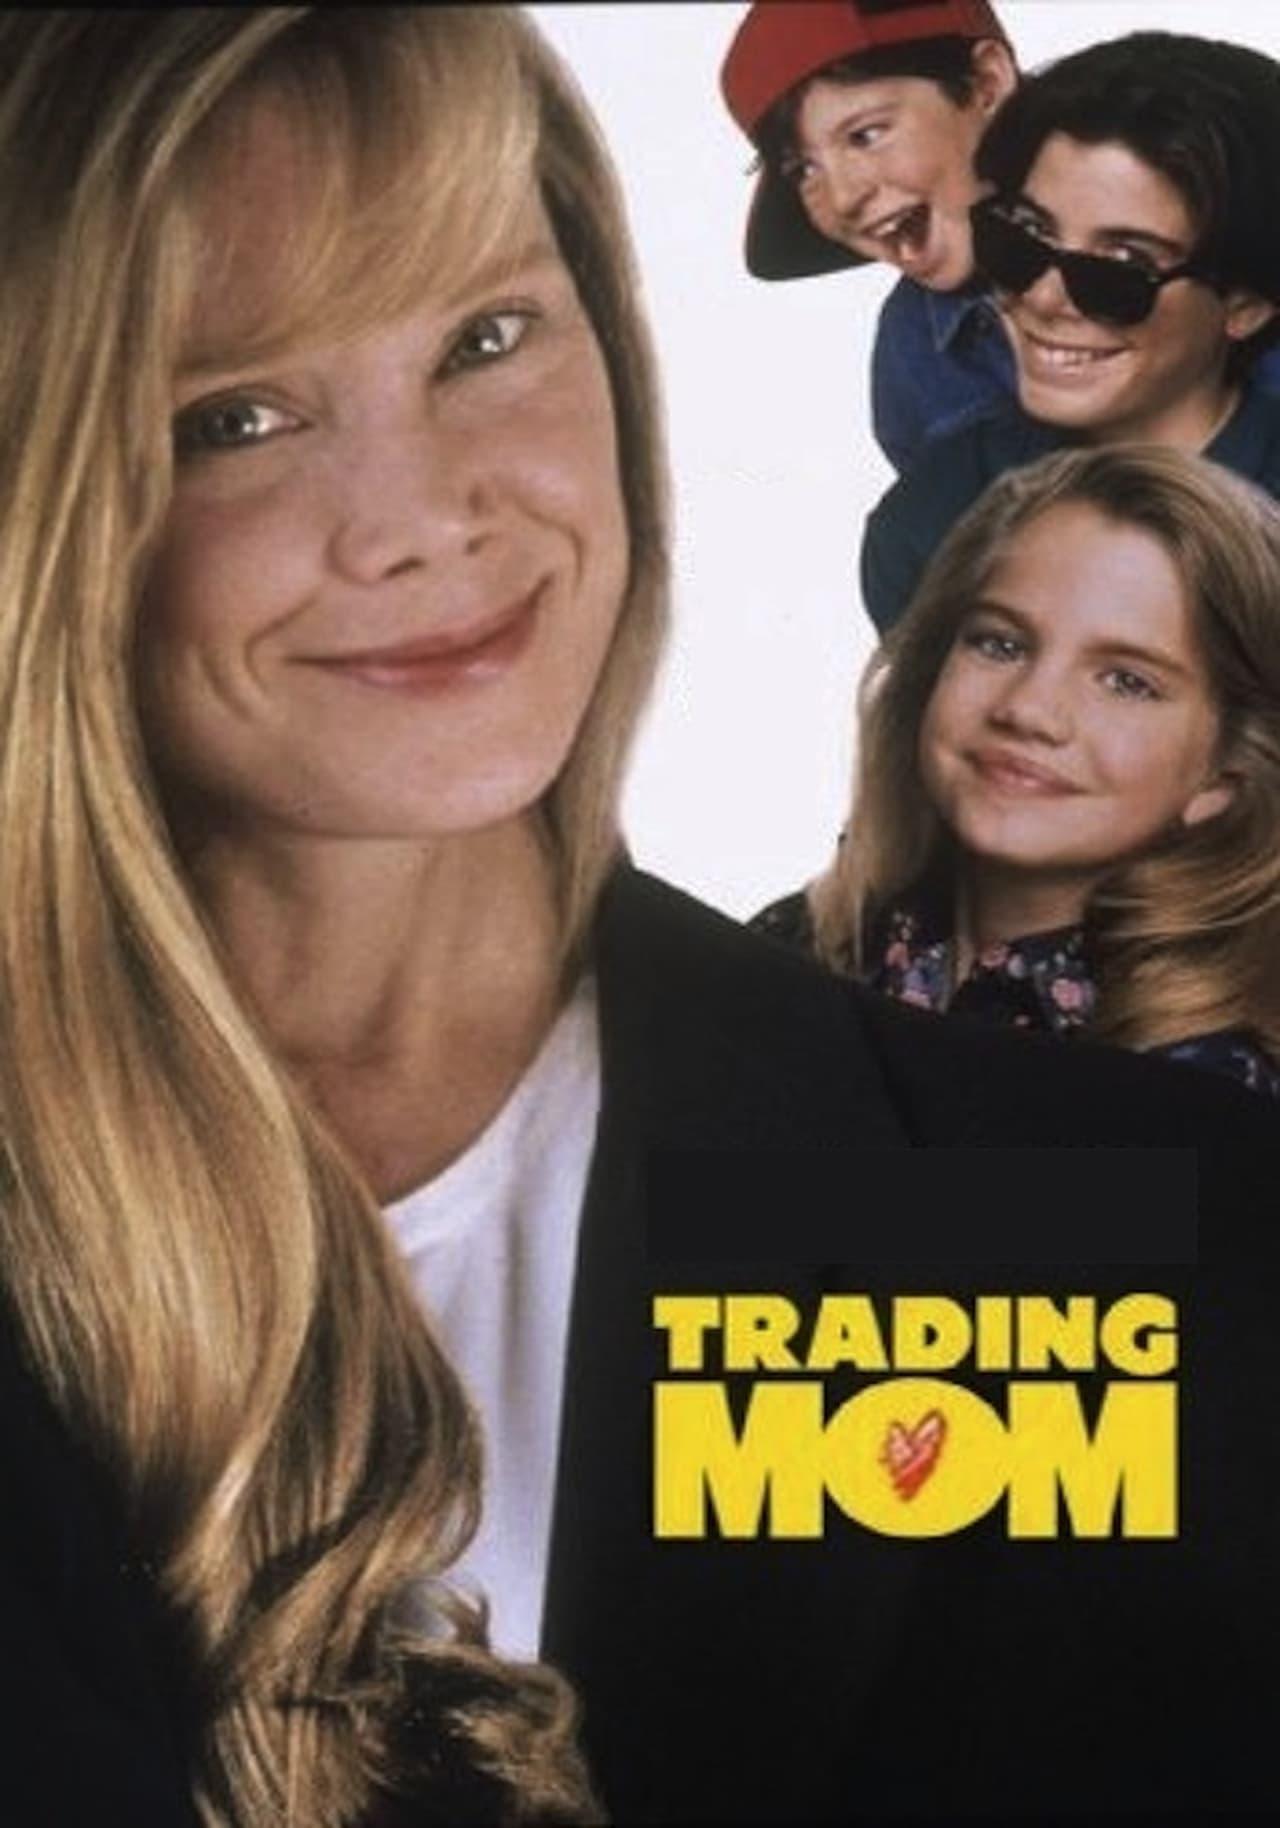 Trading Mom